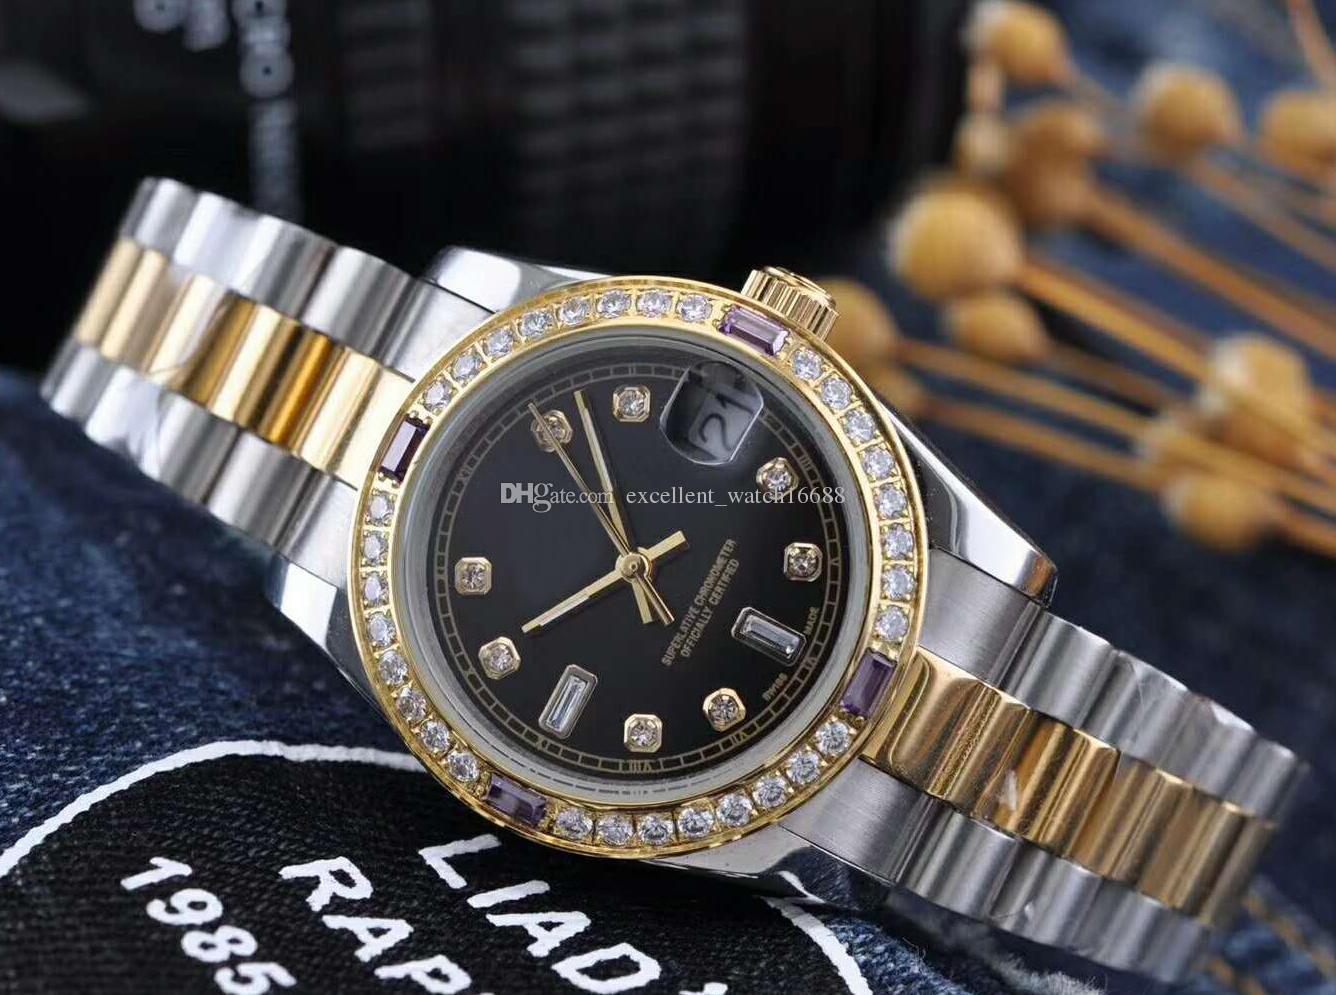 c3207bbd6 NEW Top High Fashion Luxury Brand watches 32 mm 126334 Diamond Bezel Black  Dial Diamond Quartz Two Tone Gold Excellent Women s Watches